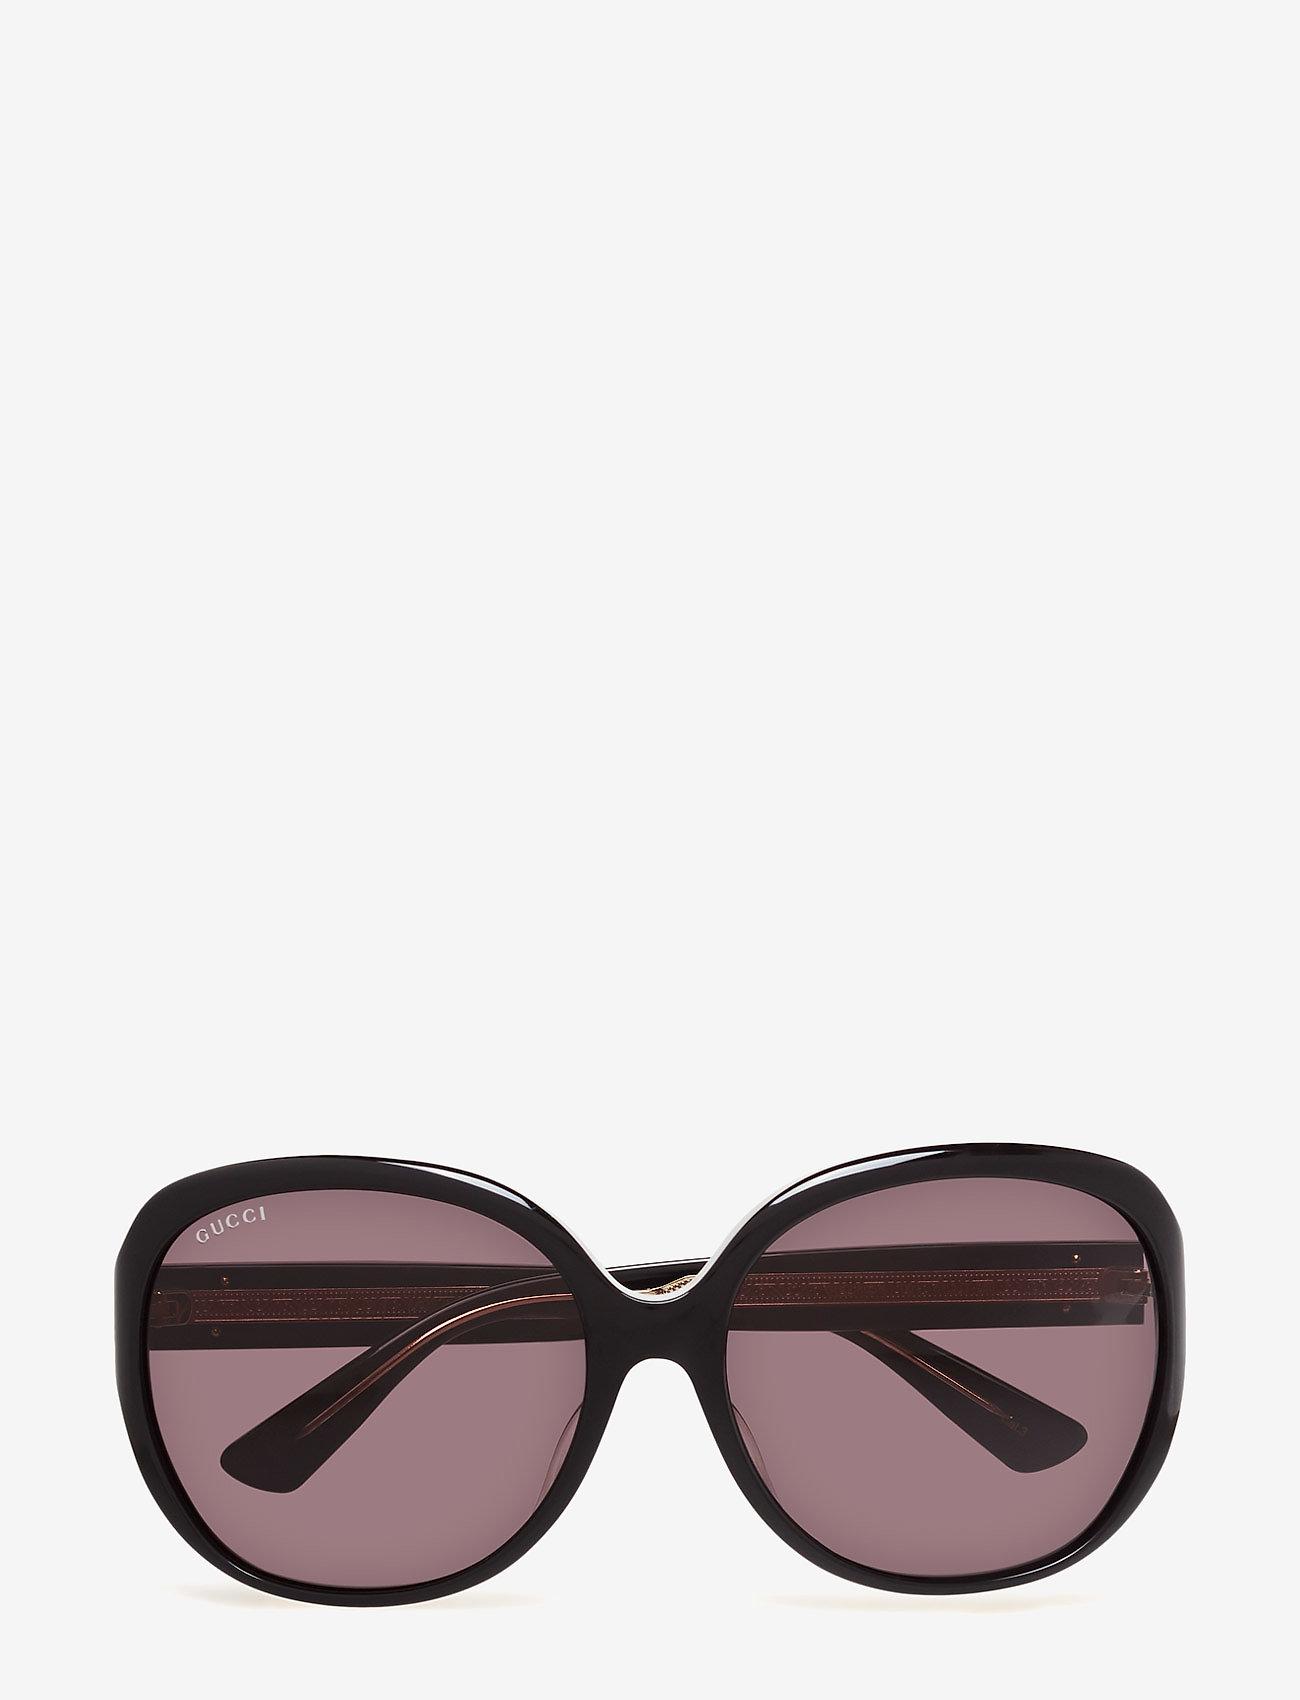 Gucci Sunglasses - GG0080SK - round frame - black-black-grey - 0